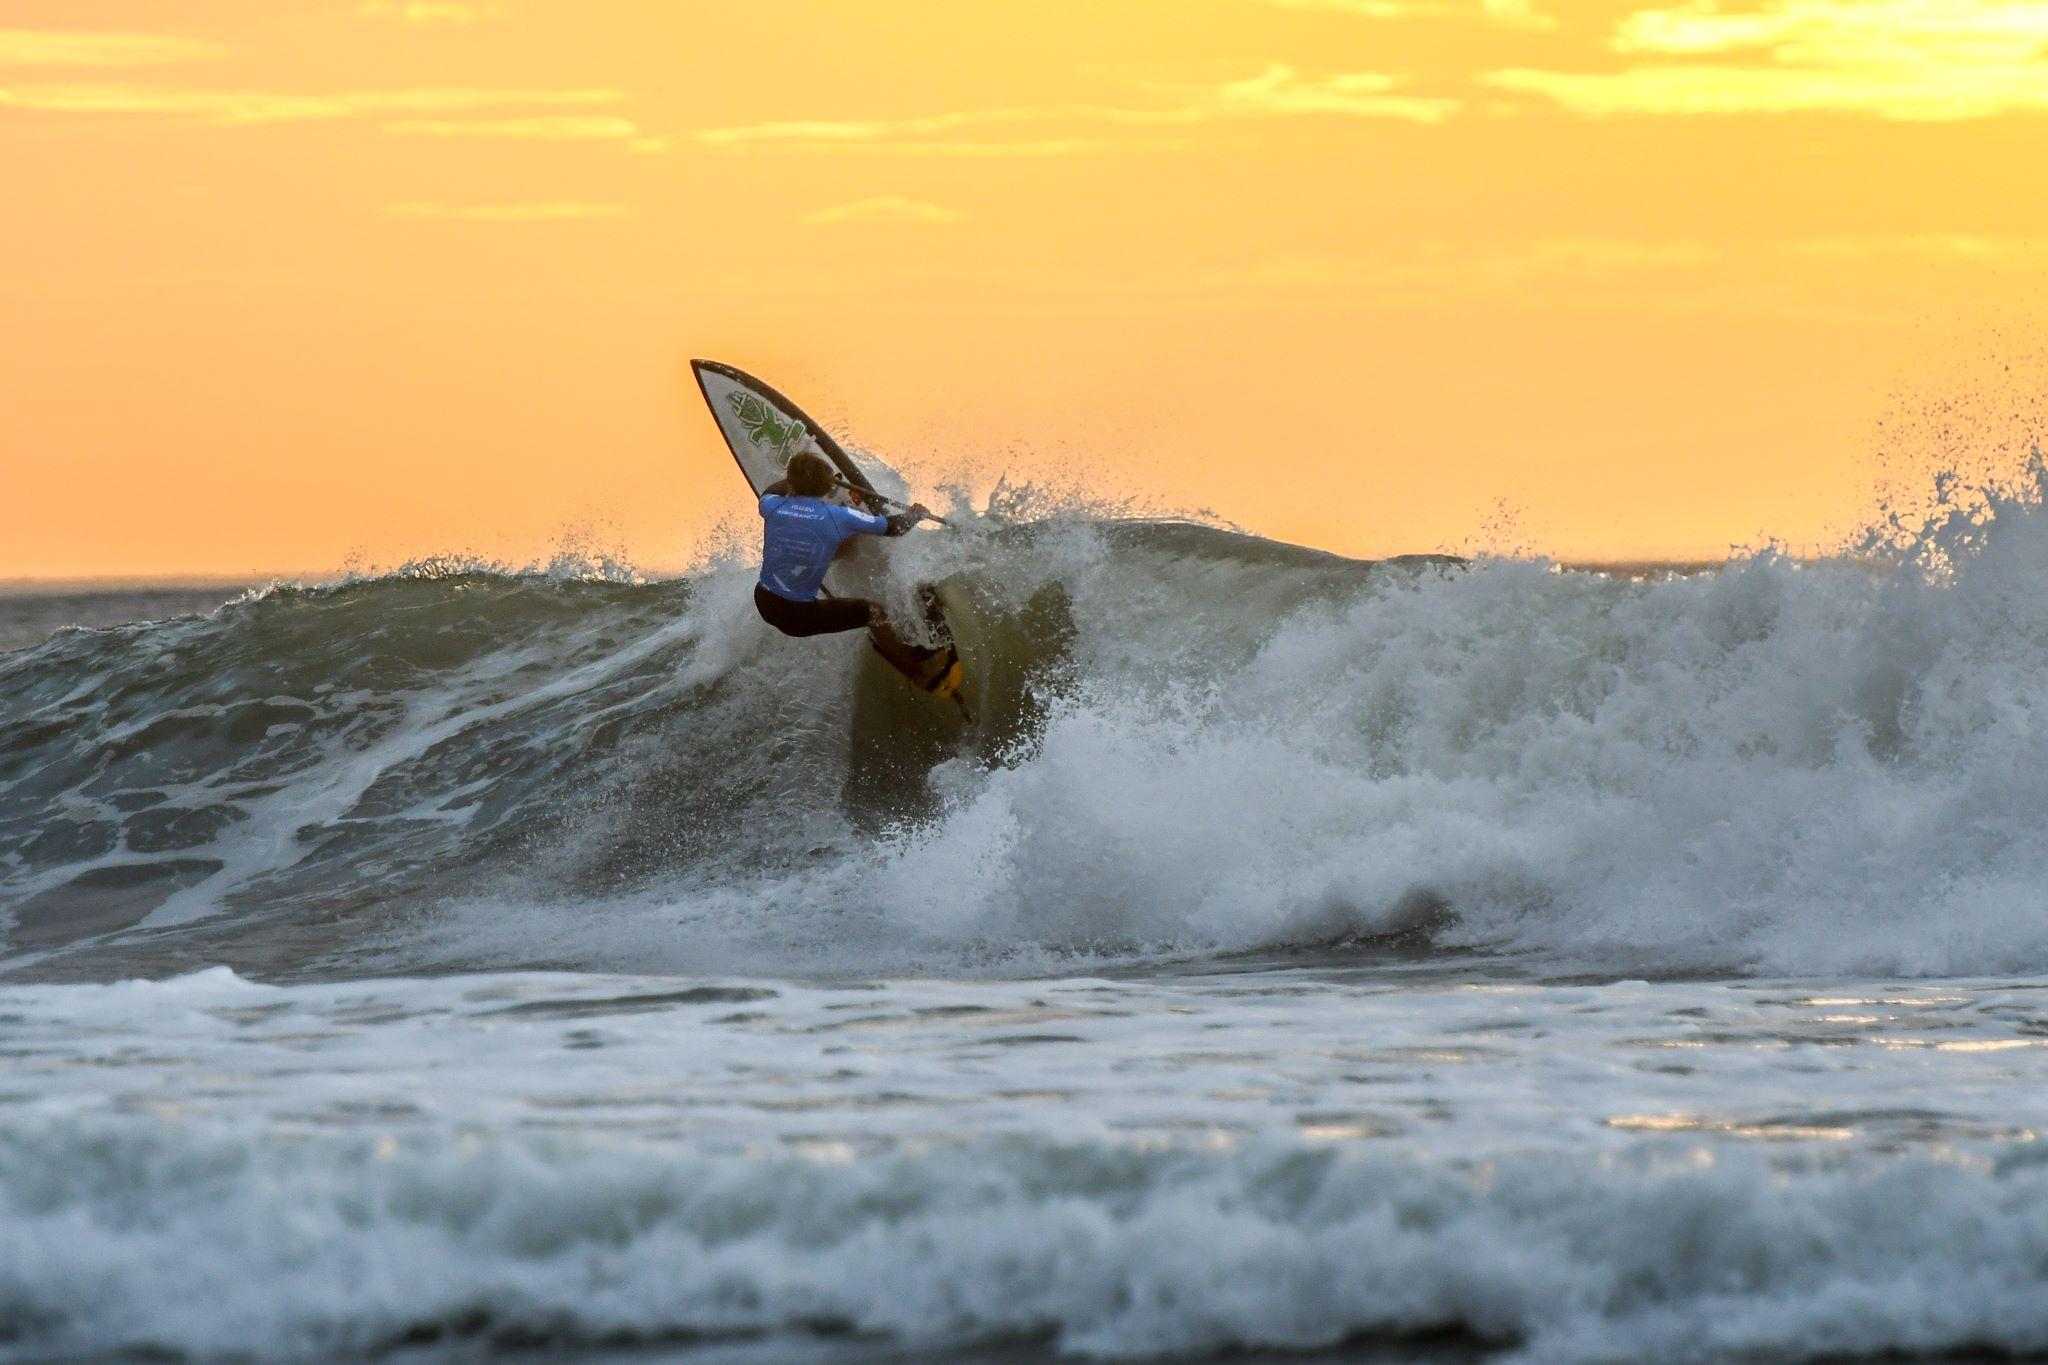 ®Benoit-CARPENTIER-Championnats-de-France-Biarritz-2016-1©-Eduardo.Vidarte.Charola